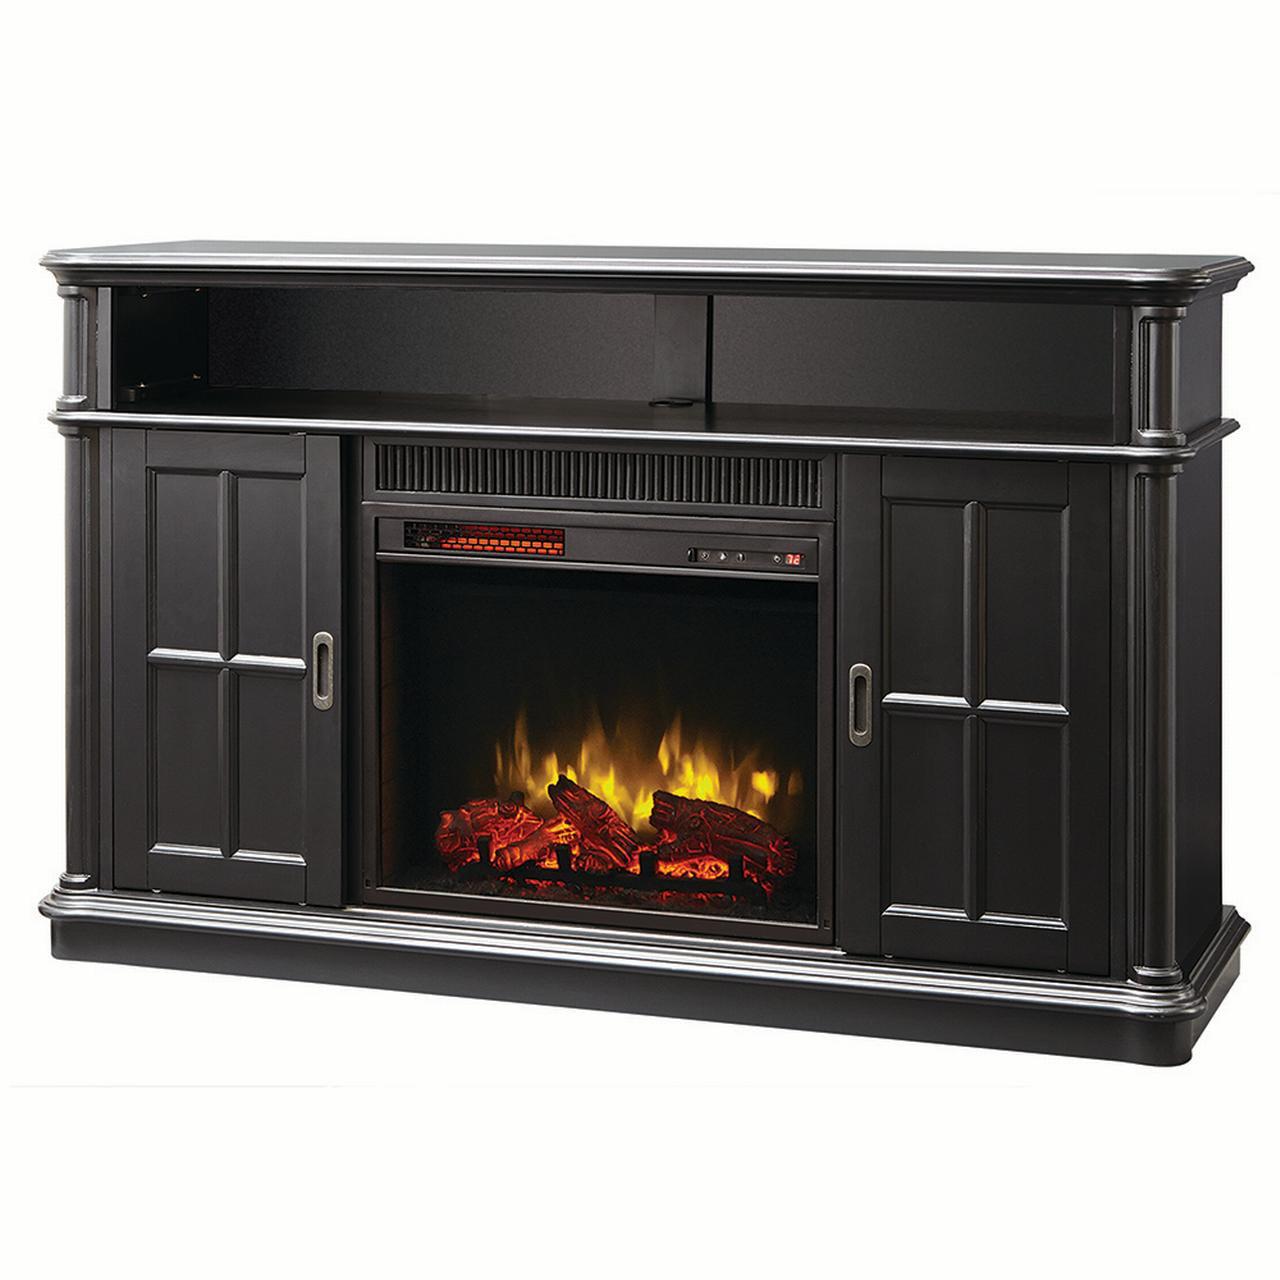 "Muskoka Albion 60"" Infrared Media Electric Fireplace - Providence Black"